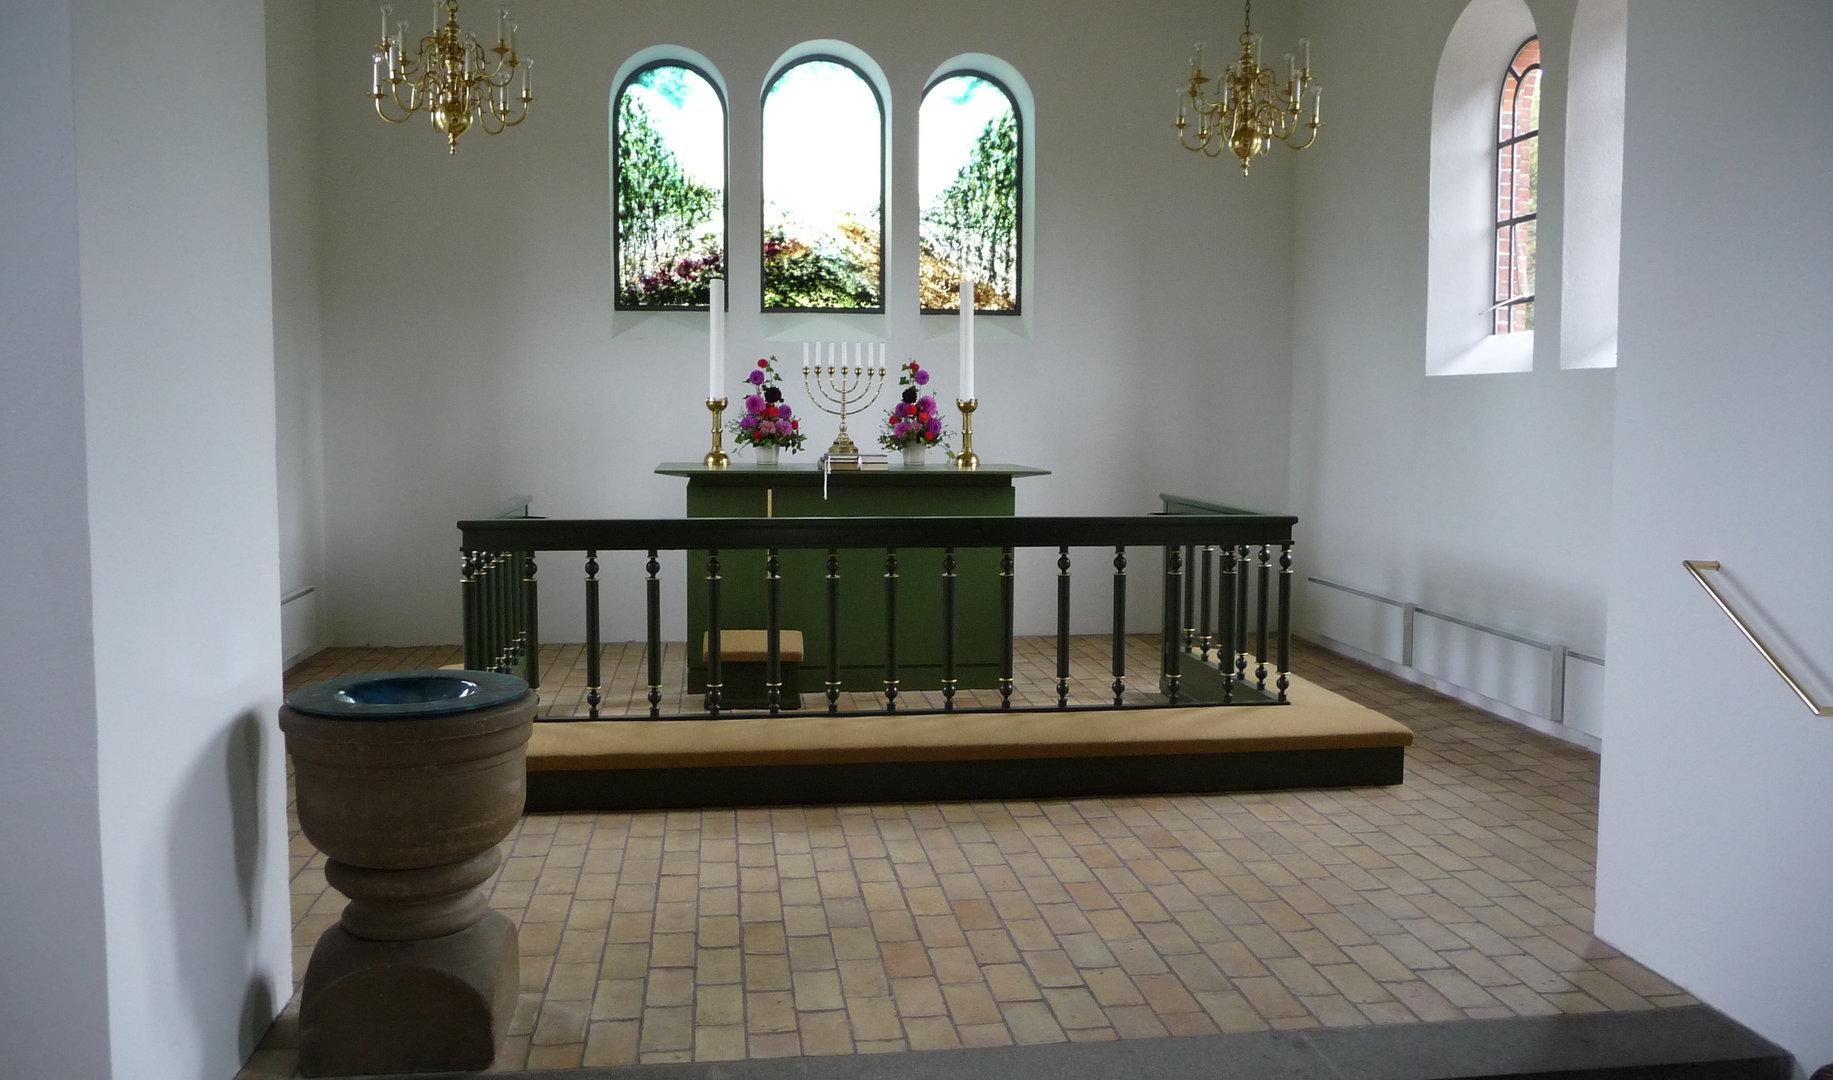 Ilskov kirke